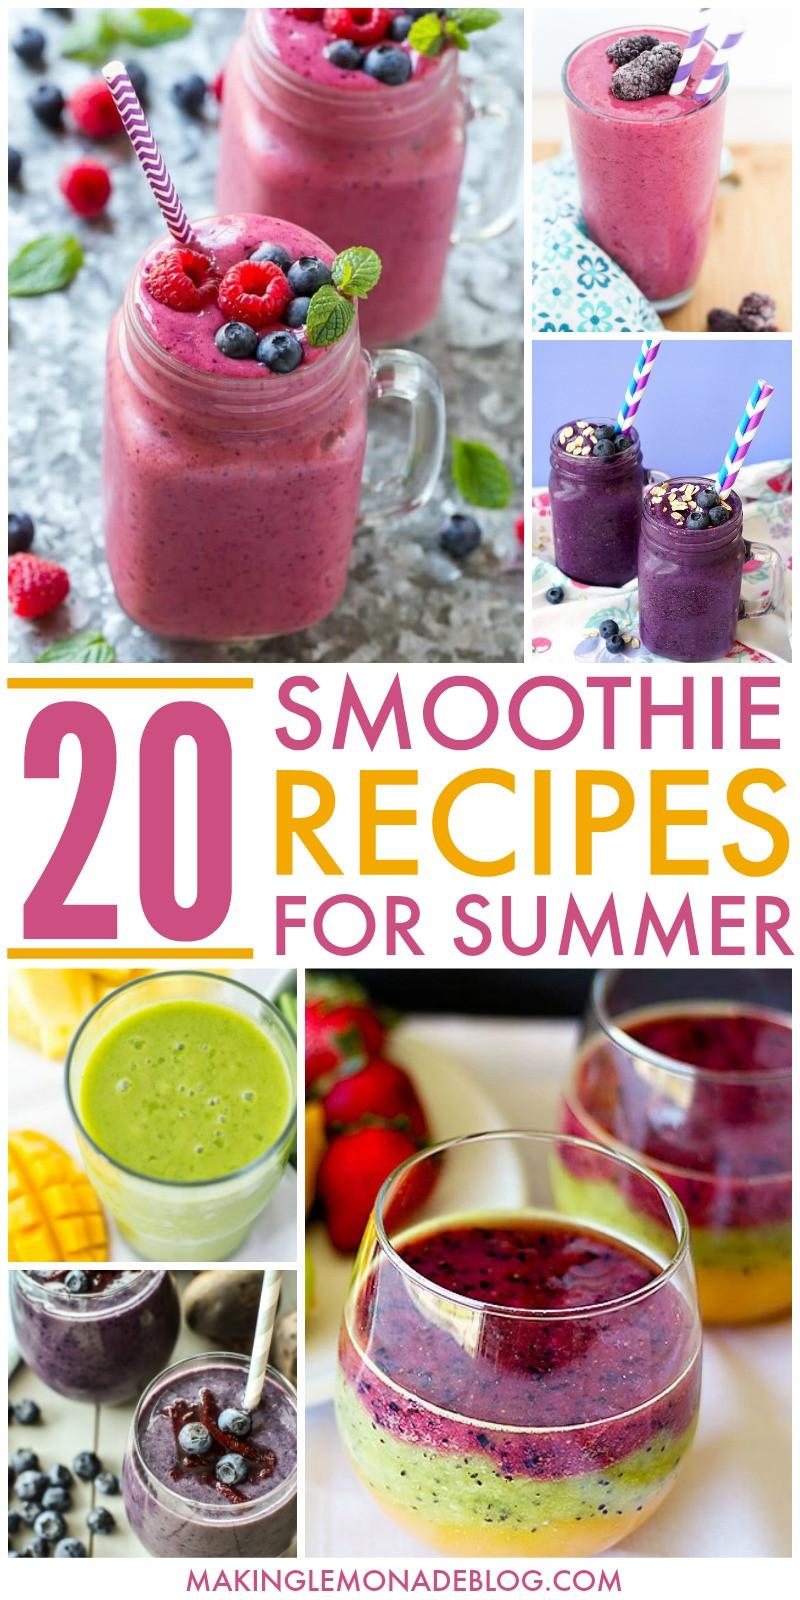 Delicious Smoothie Recipes  20 Delicious Smoothie Recipes for Summer